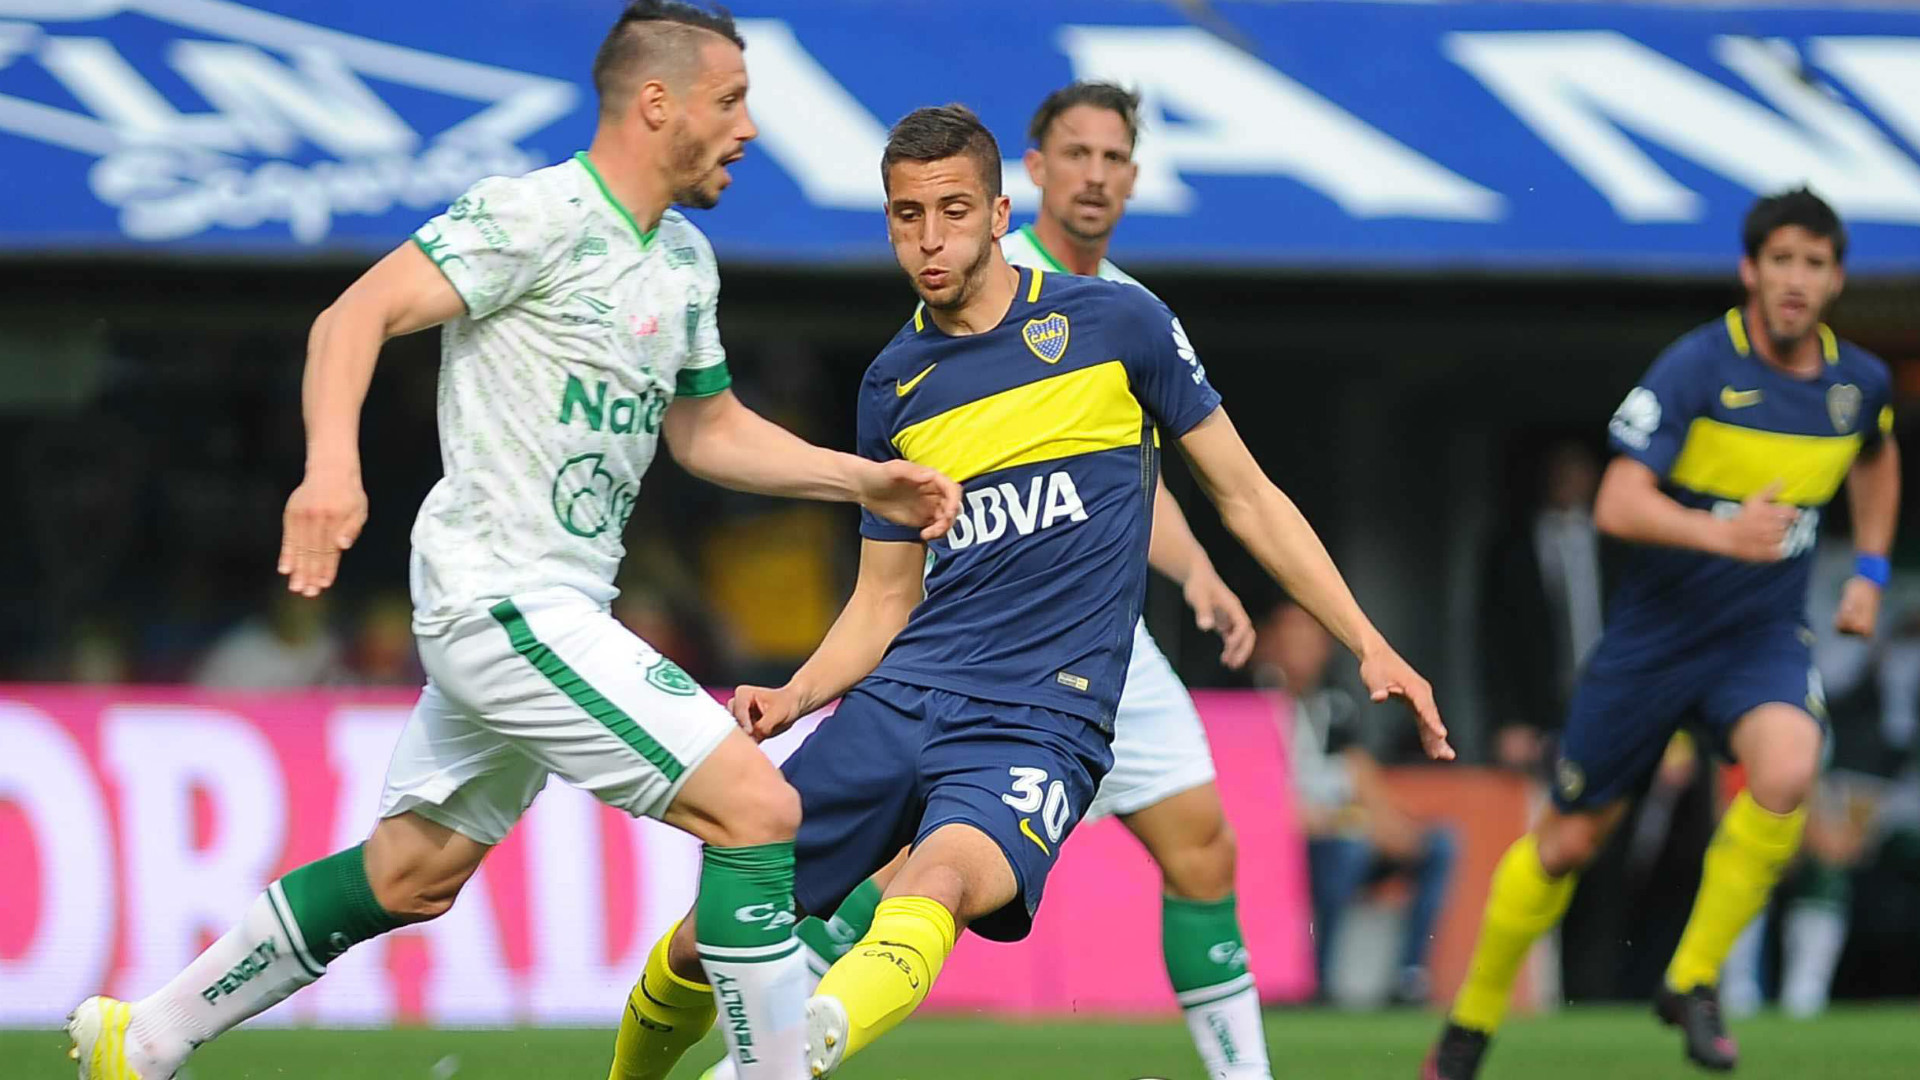 Juventus pondrá una fortuna por Rodrigo Bentancur